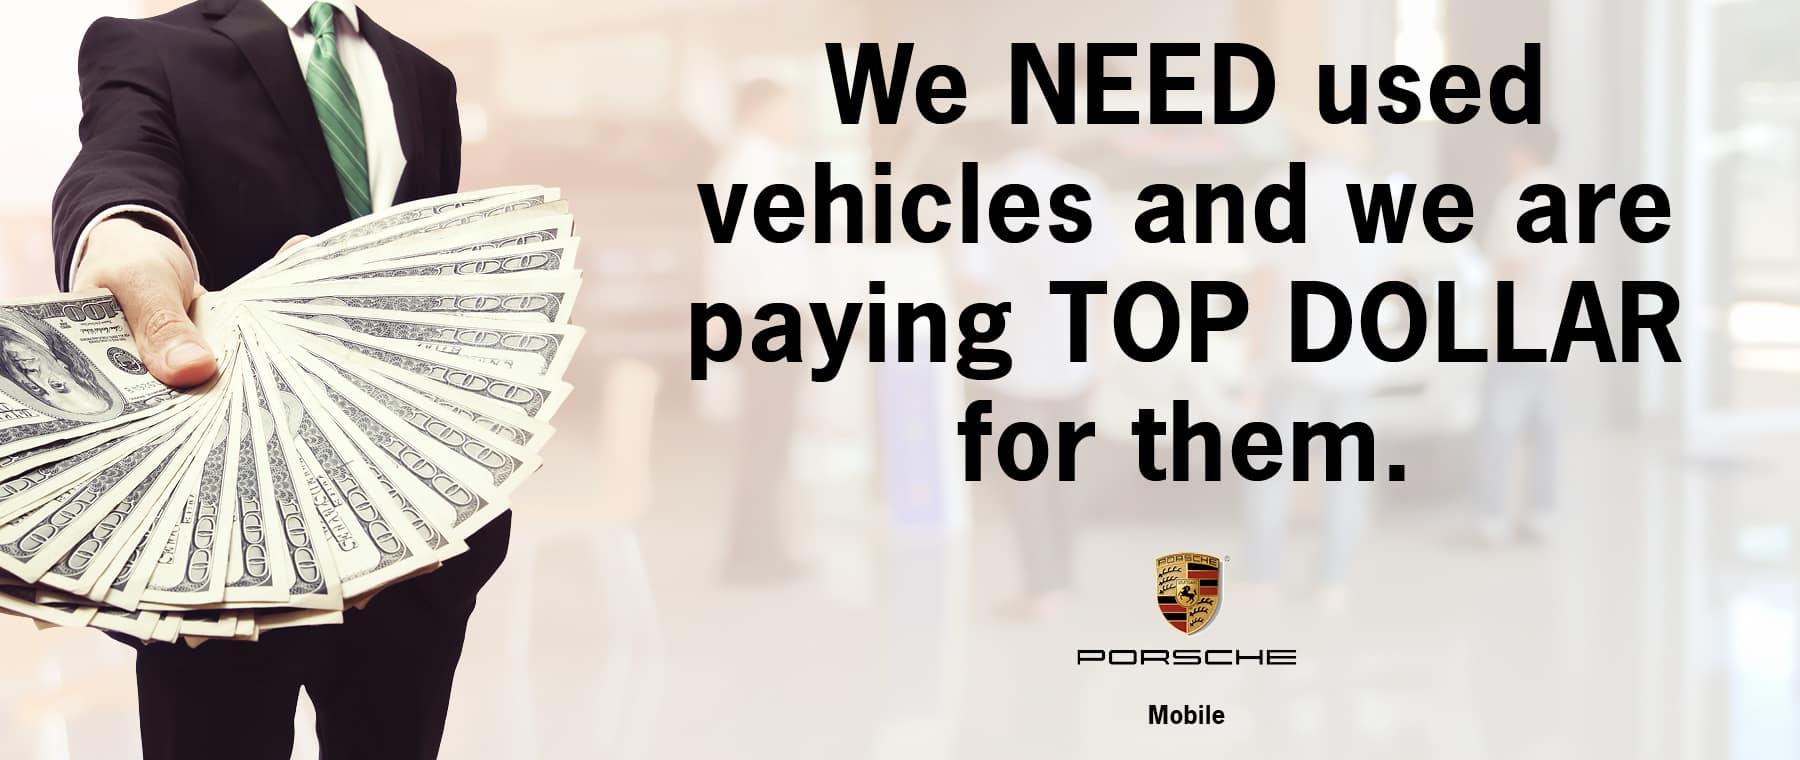 Gulf-Coast-Auto-Group-2021-06-Used-Vehicle-Banners_desktop2